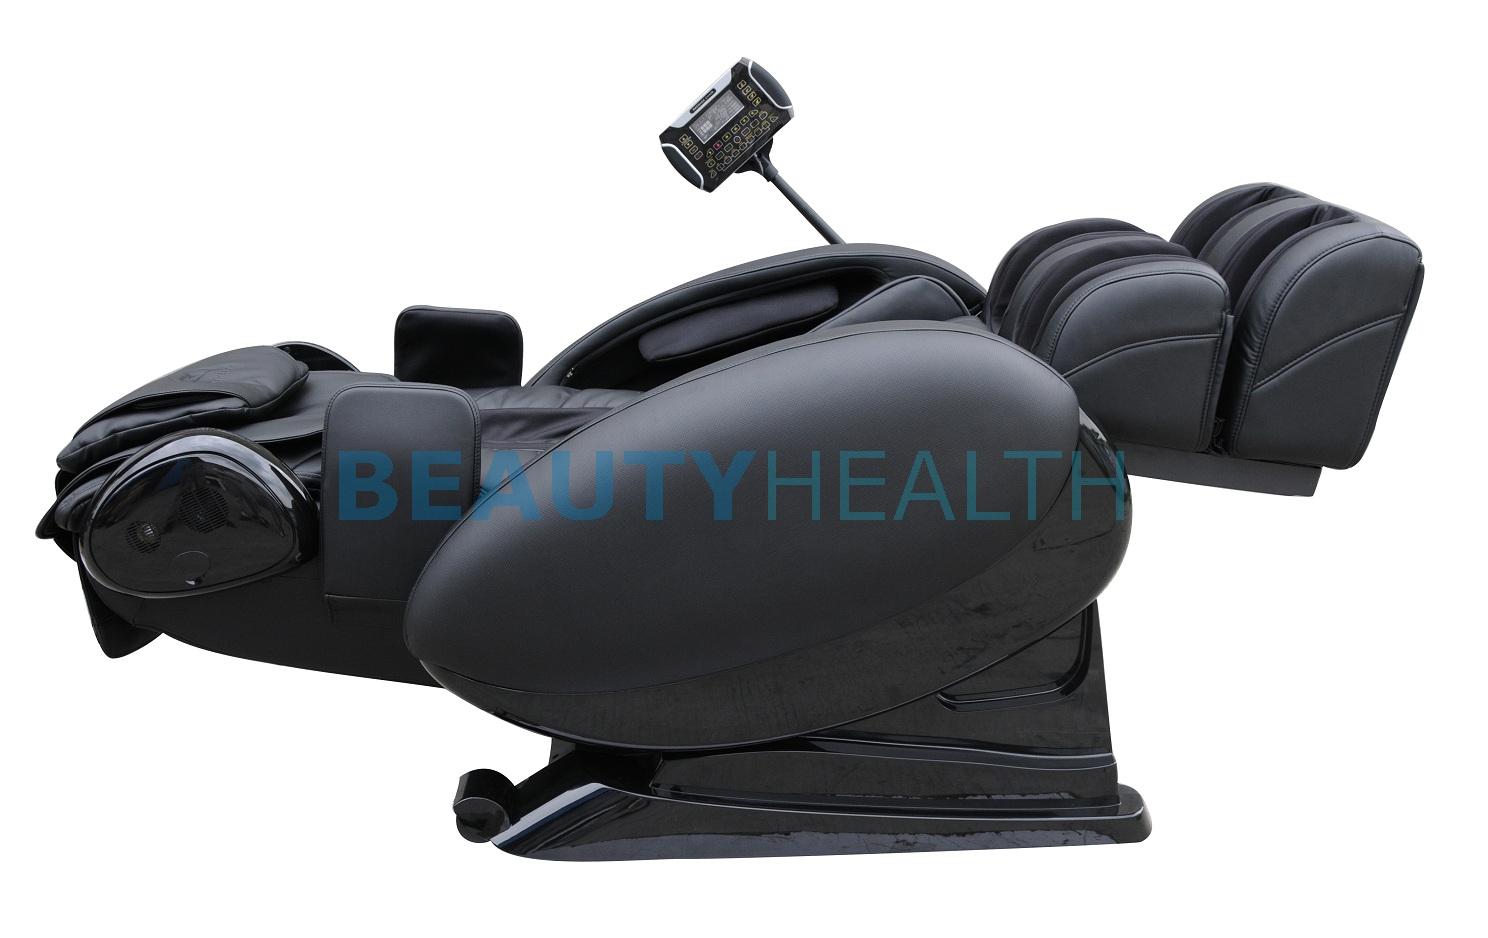 massage chairs for less chair leg fishing floats new beautyhealth bc supreme a zero gravity shiatsu